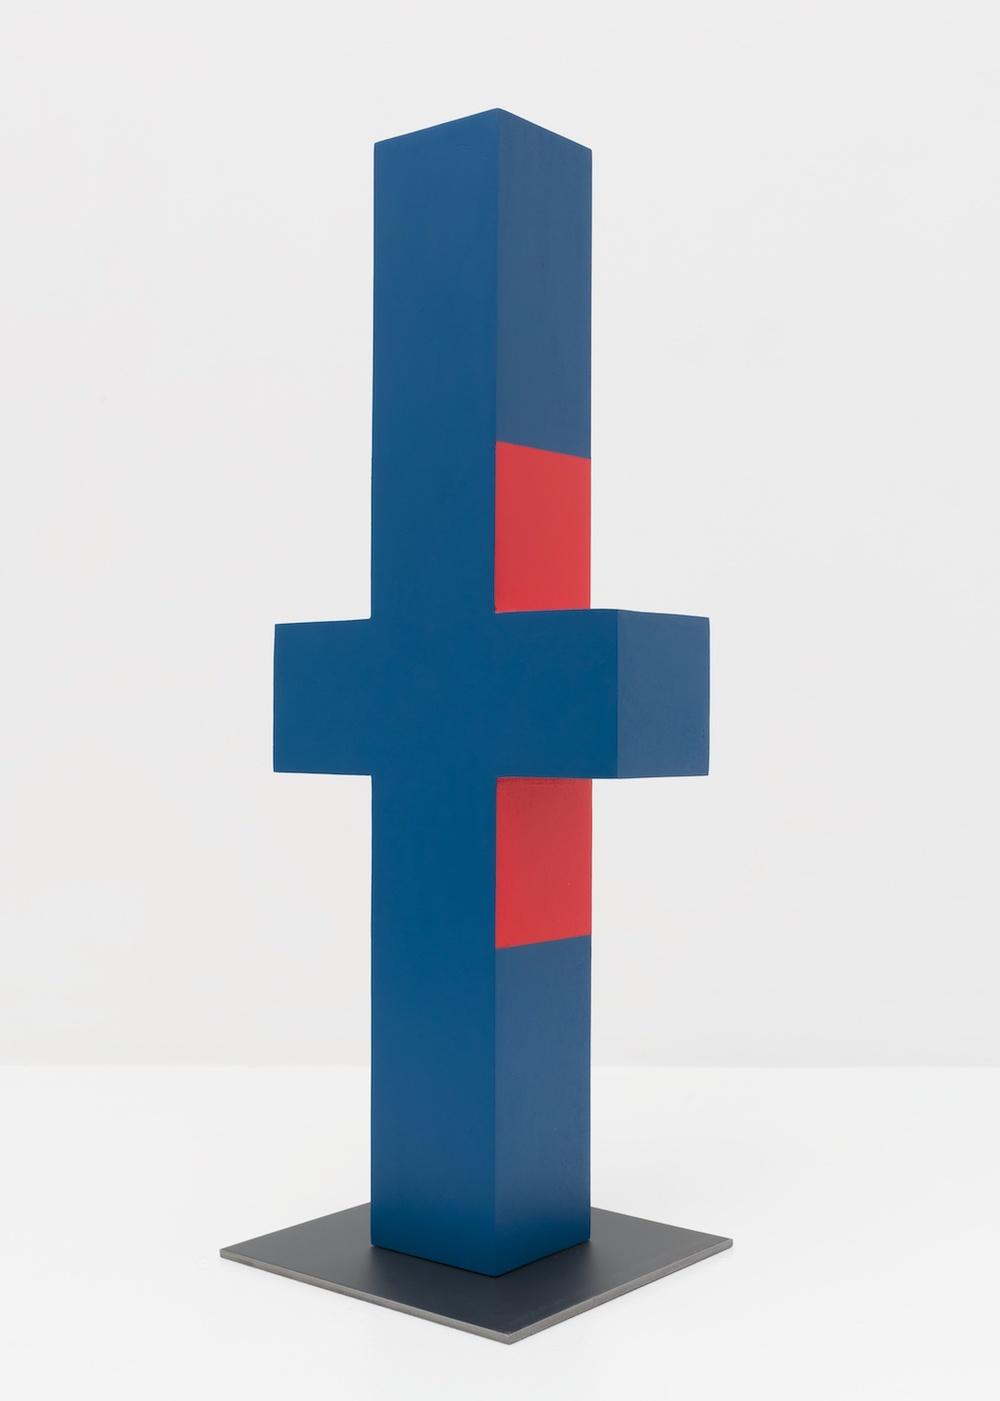 Lisa Williamson  Untitled  2015 Acrylic on wood, steel base 23 ½h x 9 ½w x 3 ½d in LW147